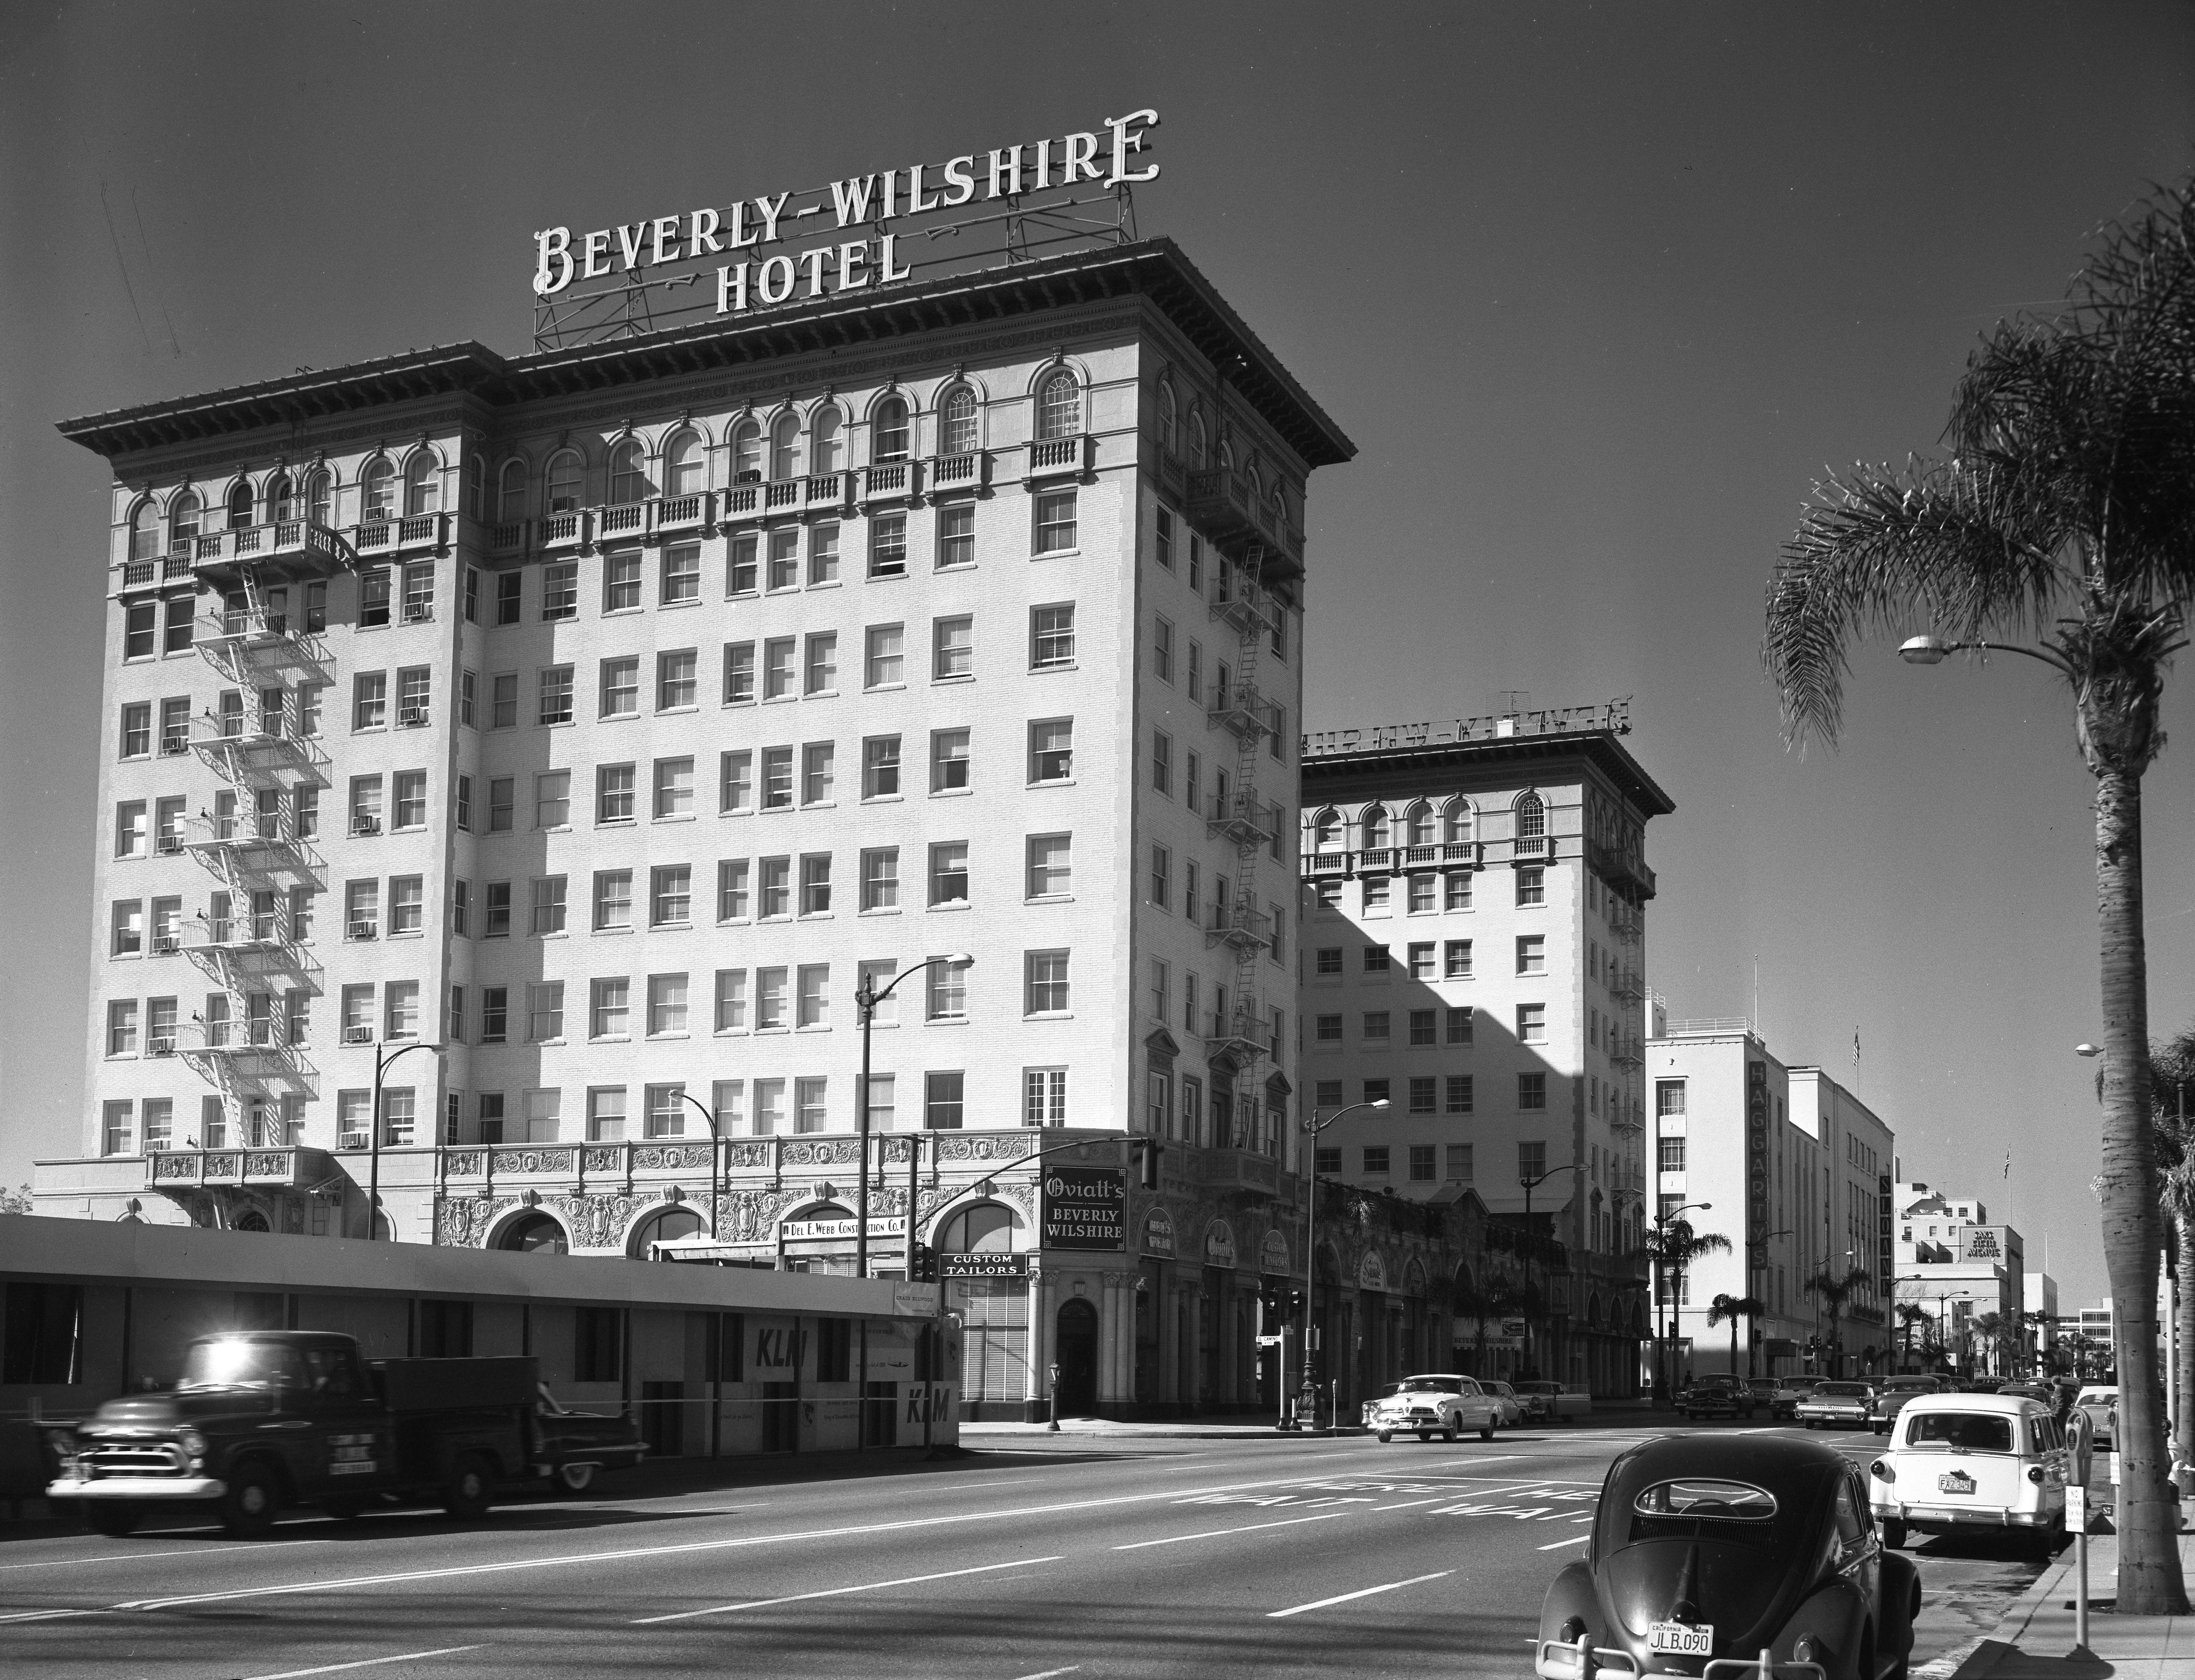 The Knickerbocker Hotel Los Angeles